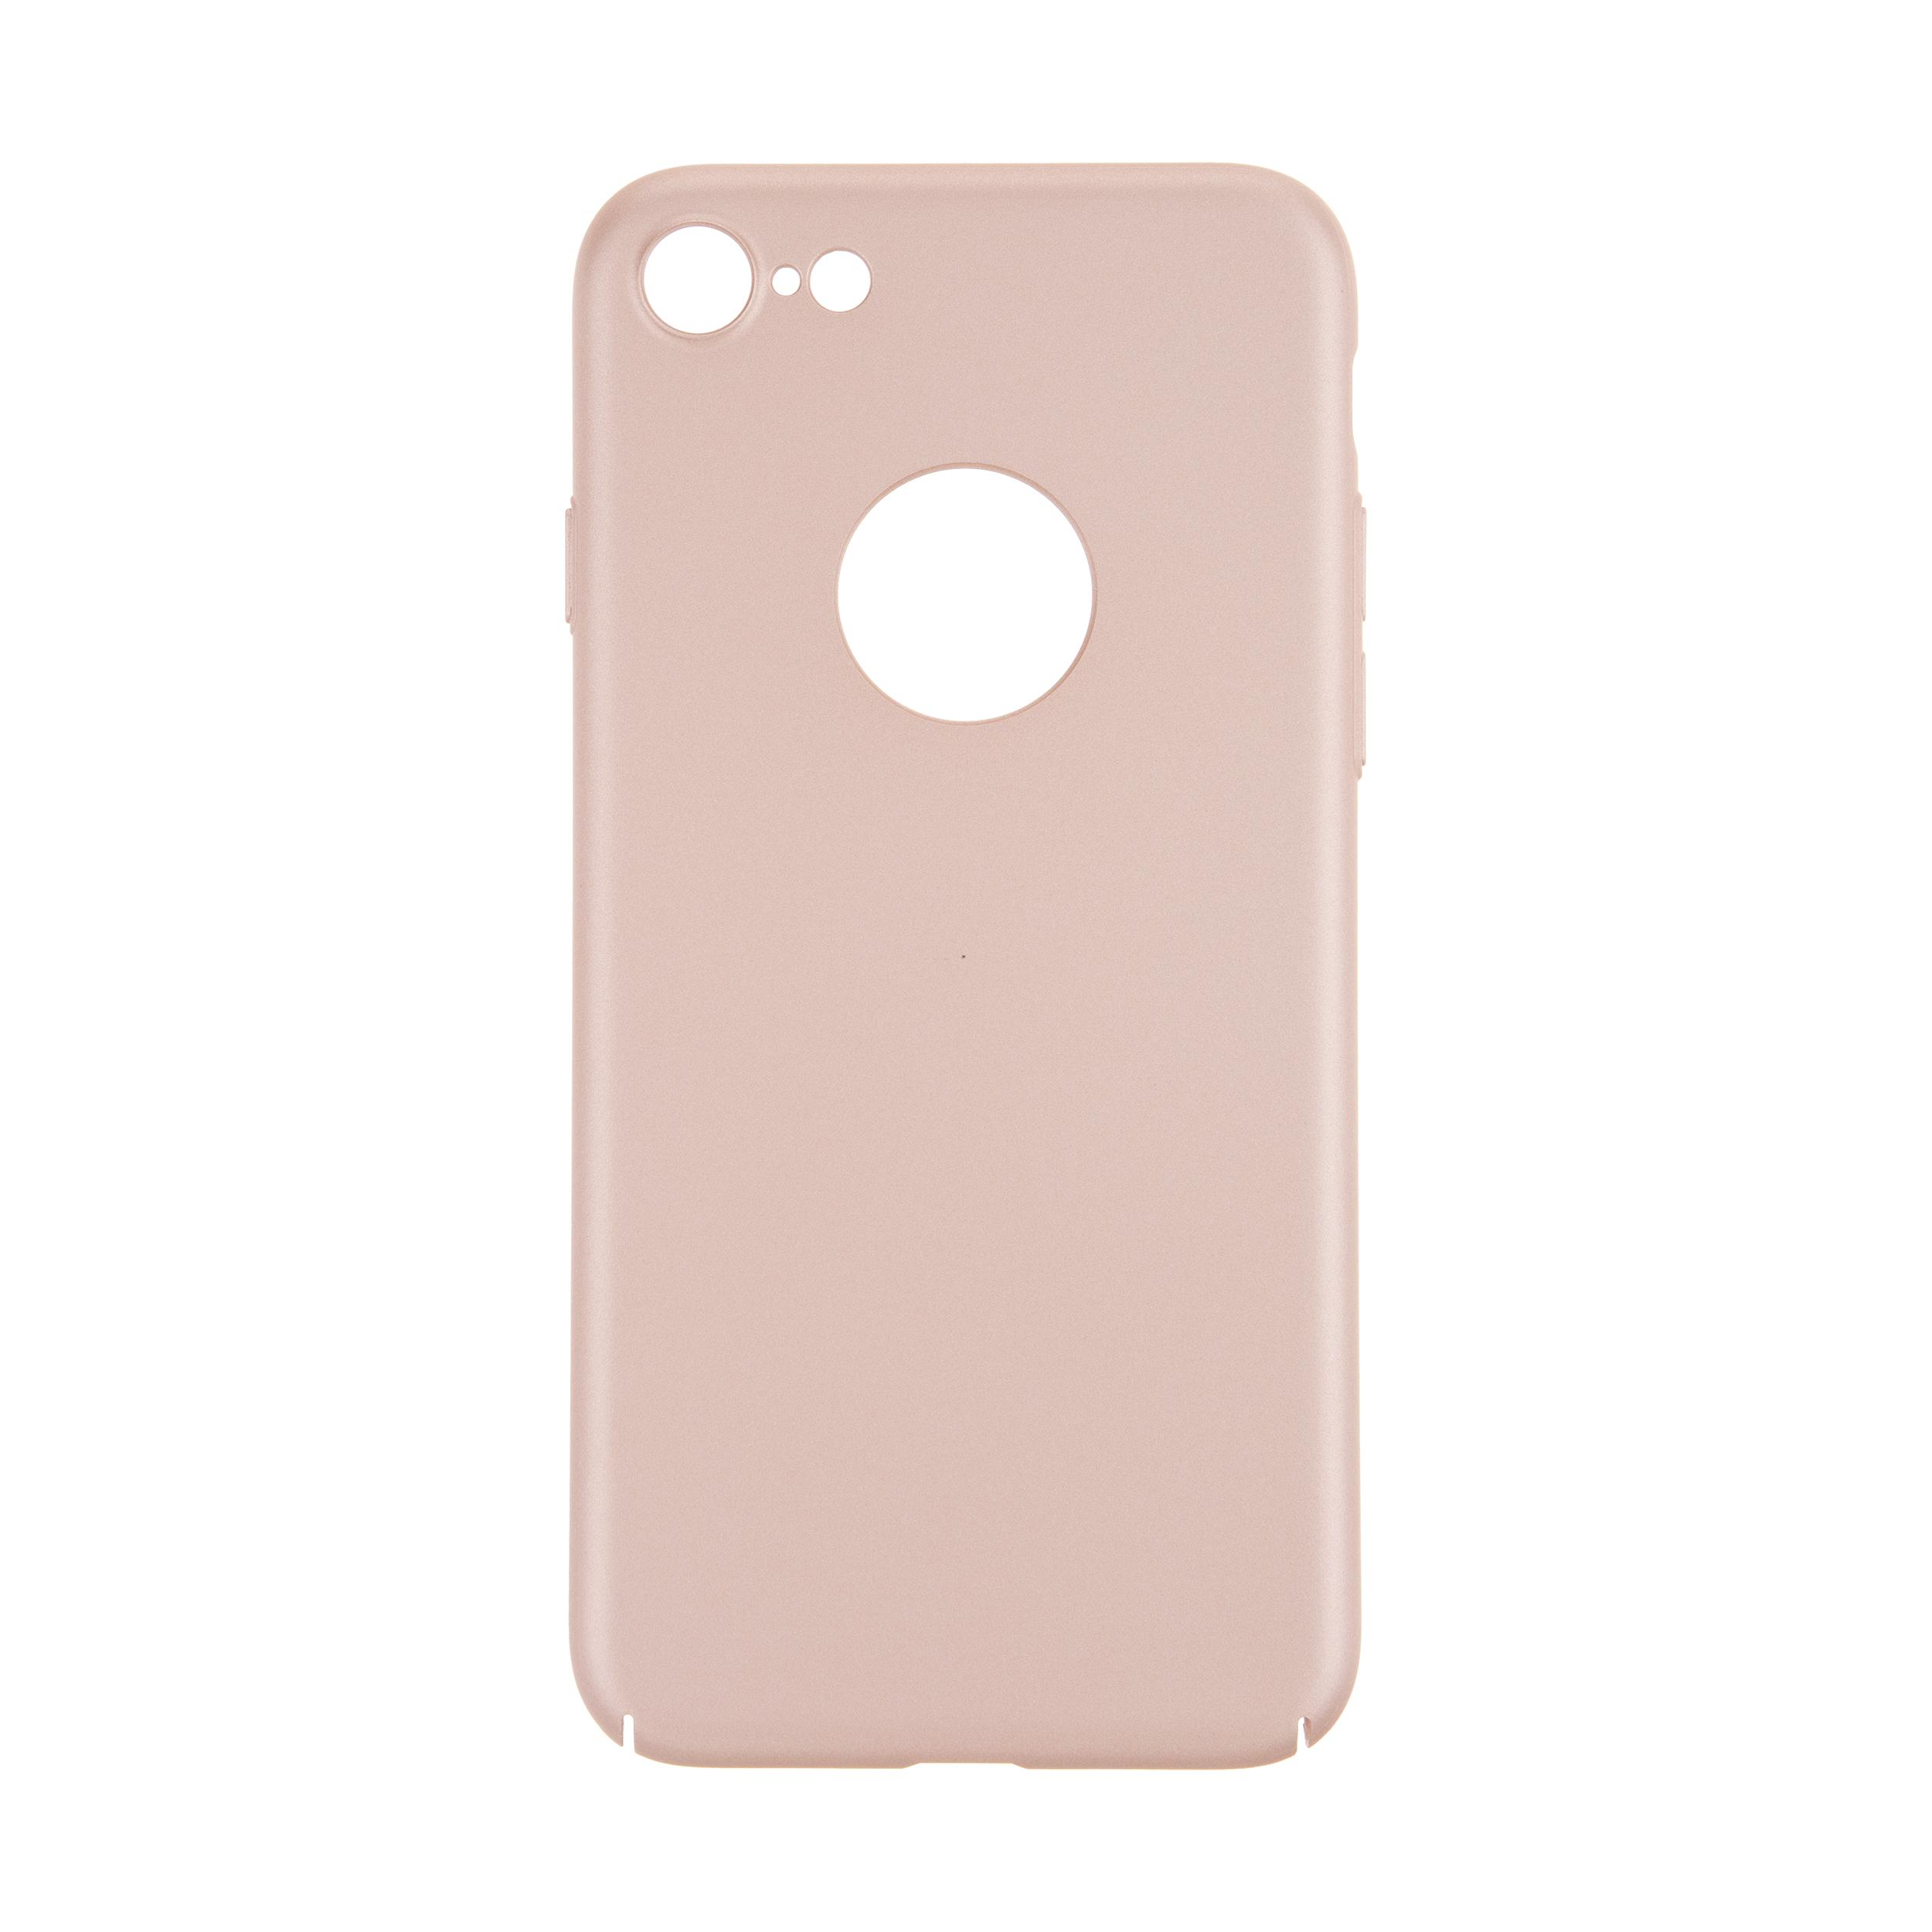 کاور جوی روم مدل JR-BP201 مناسب برای گوشی موبایل اپل iPhone 7